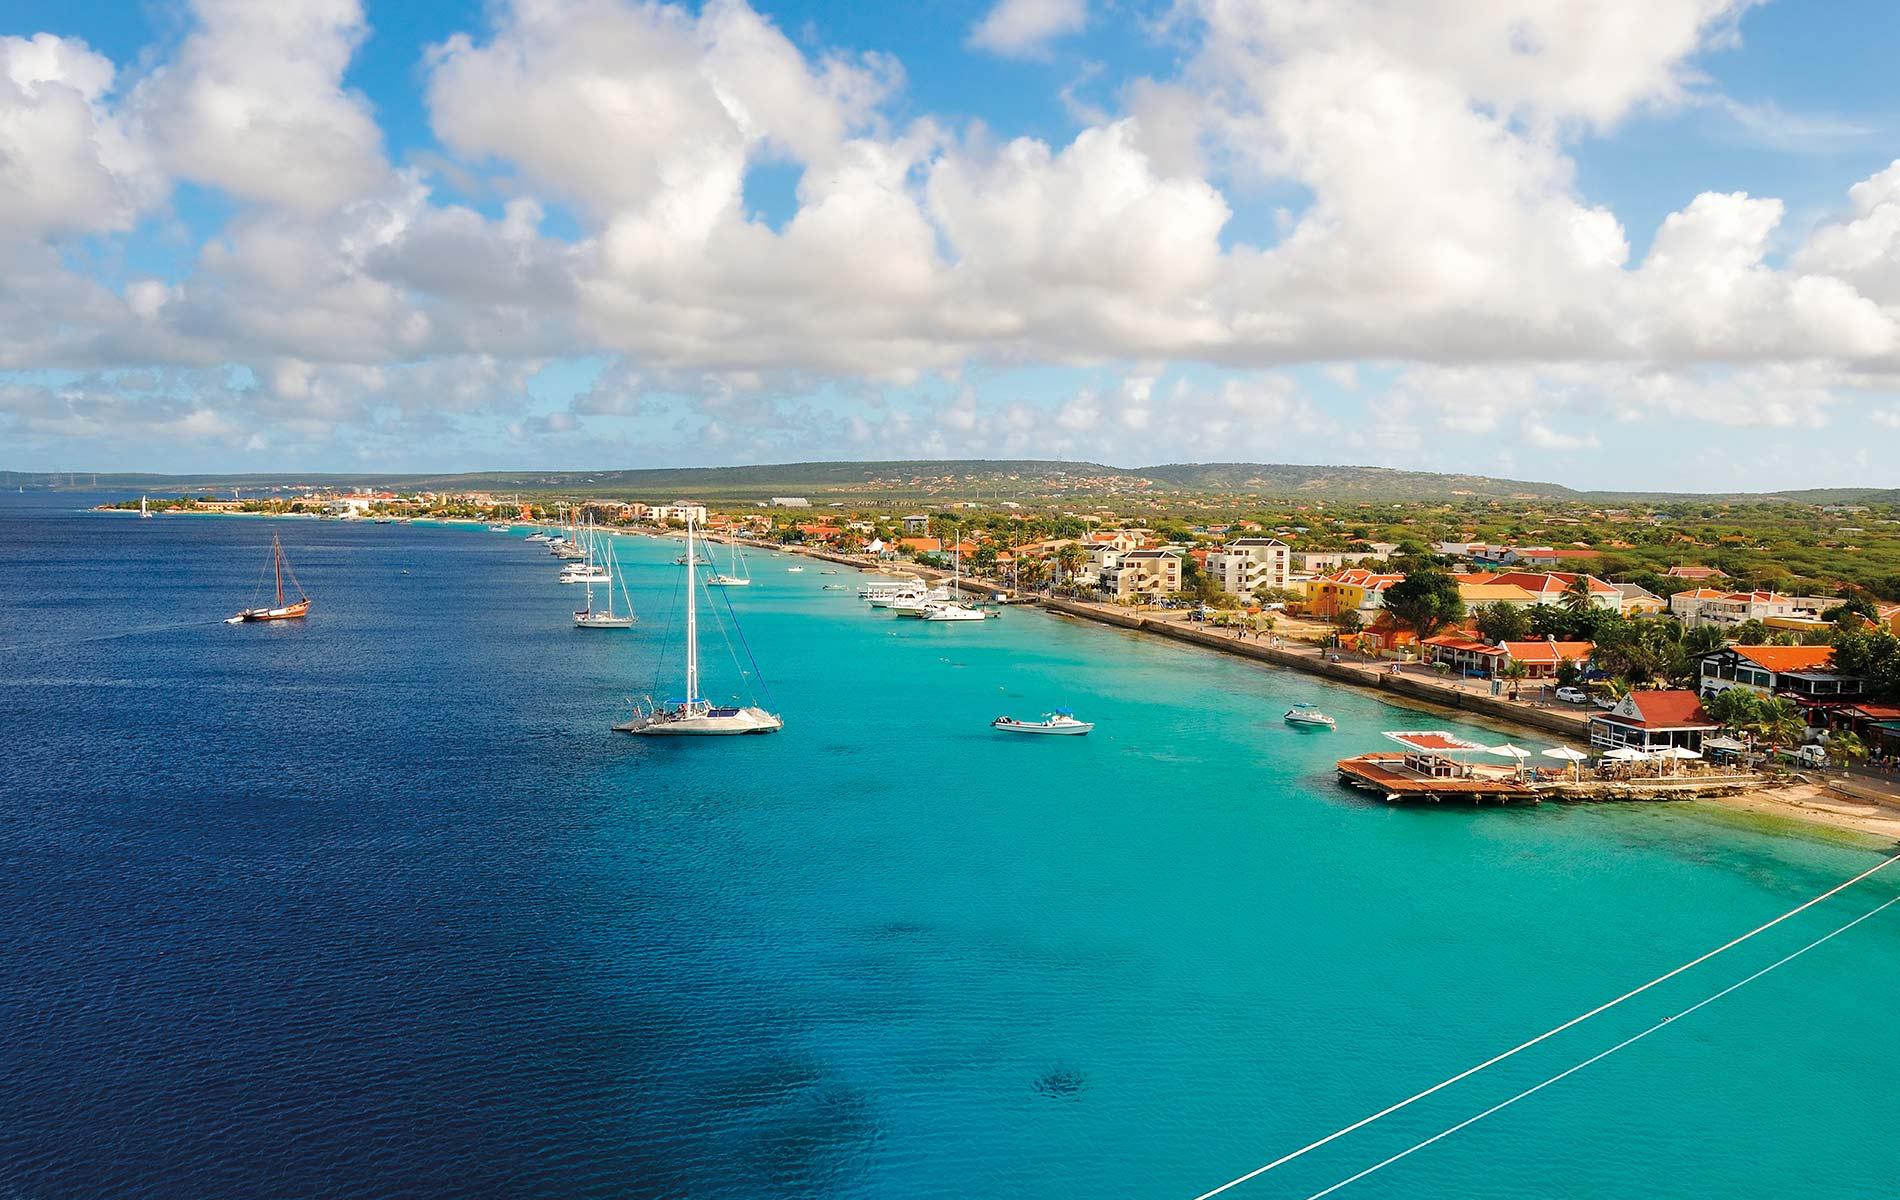 Vie Magazine Bonaire scenic view